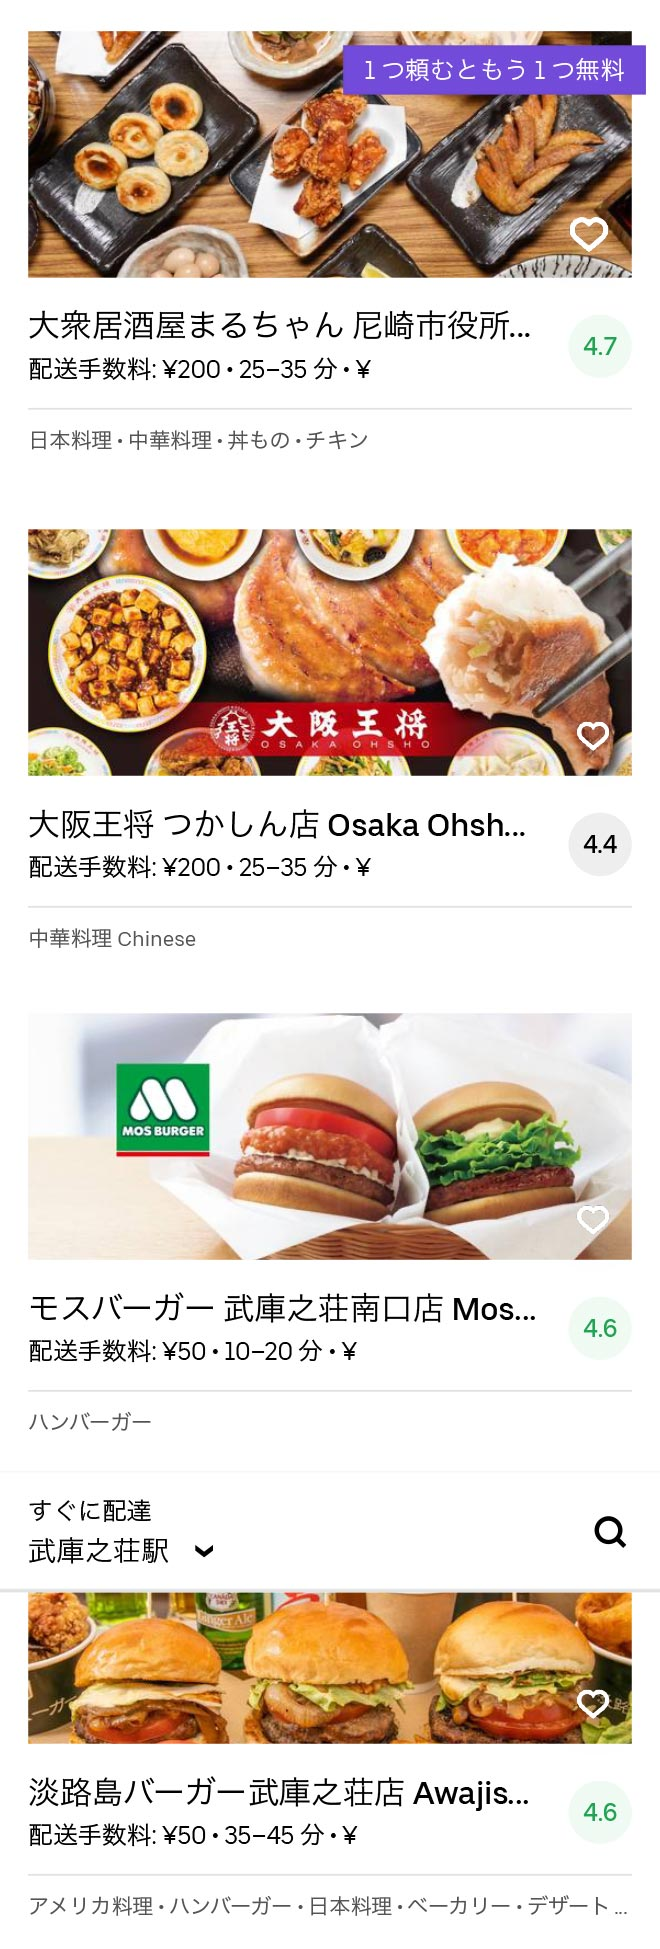 Amagasaki mukonosou menu 2005 02